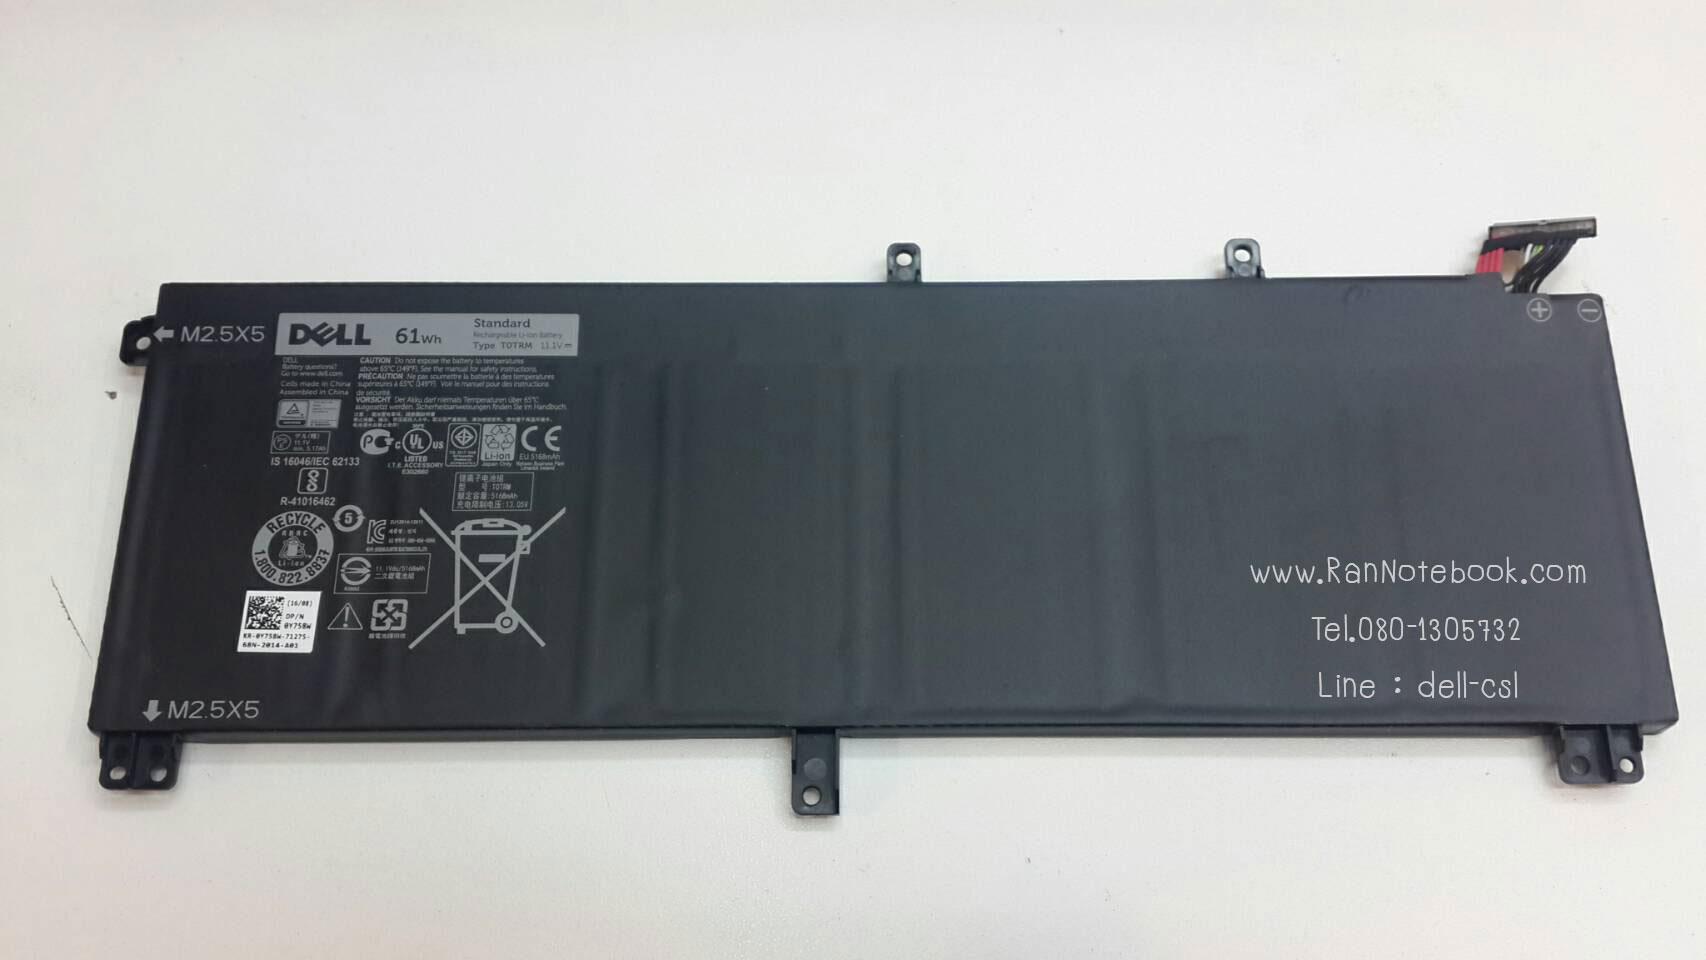 Battery DELL Precision M3800 61WHr ของแท้ ประกัน ศูนย์ DELL ราคา ไม่แพง